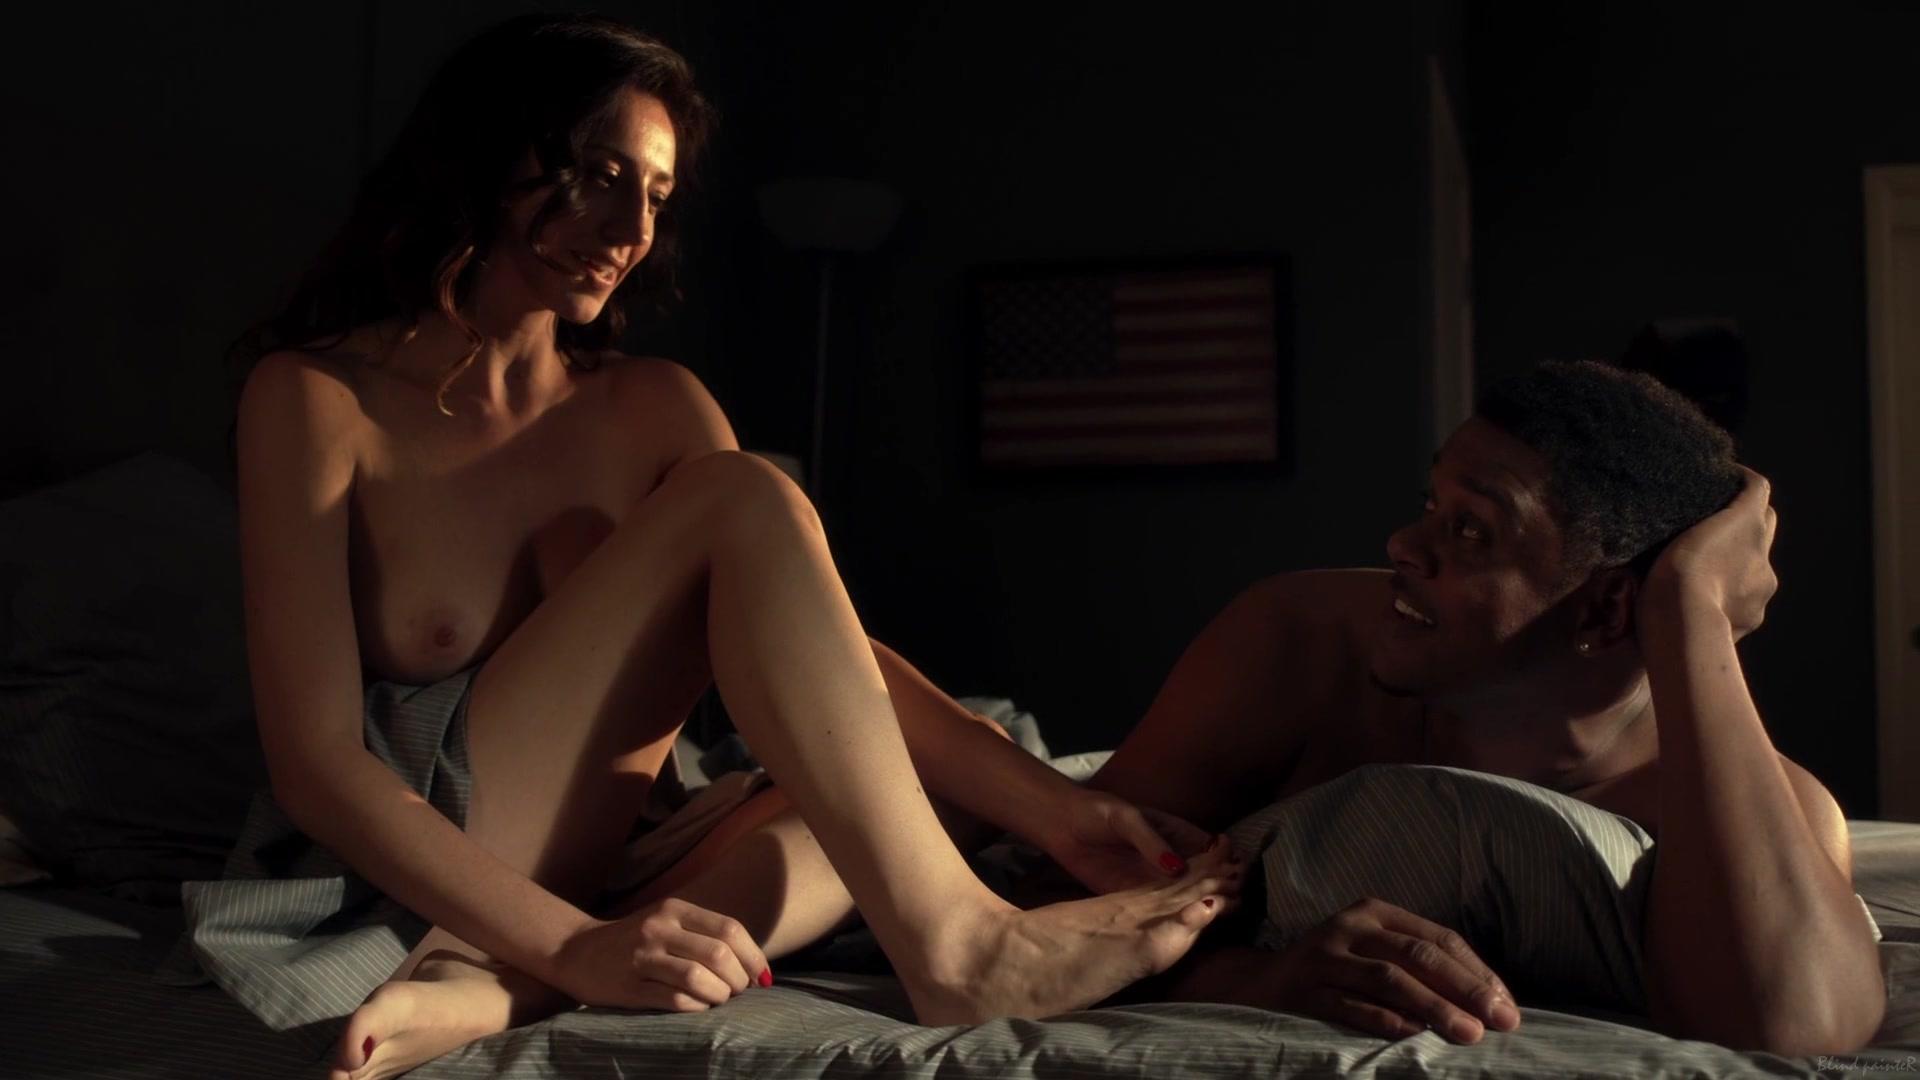 Watch novocaine sex scene